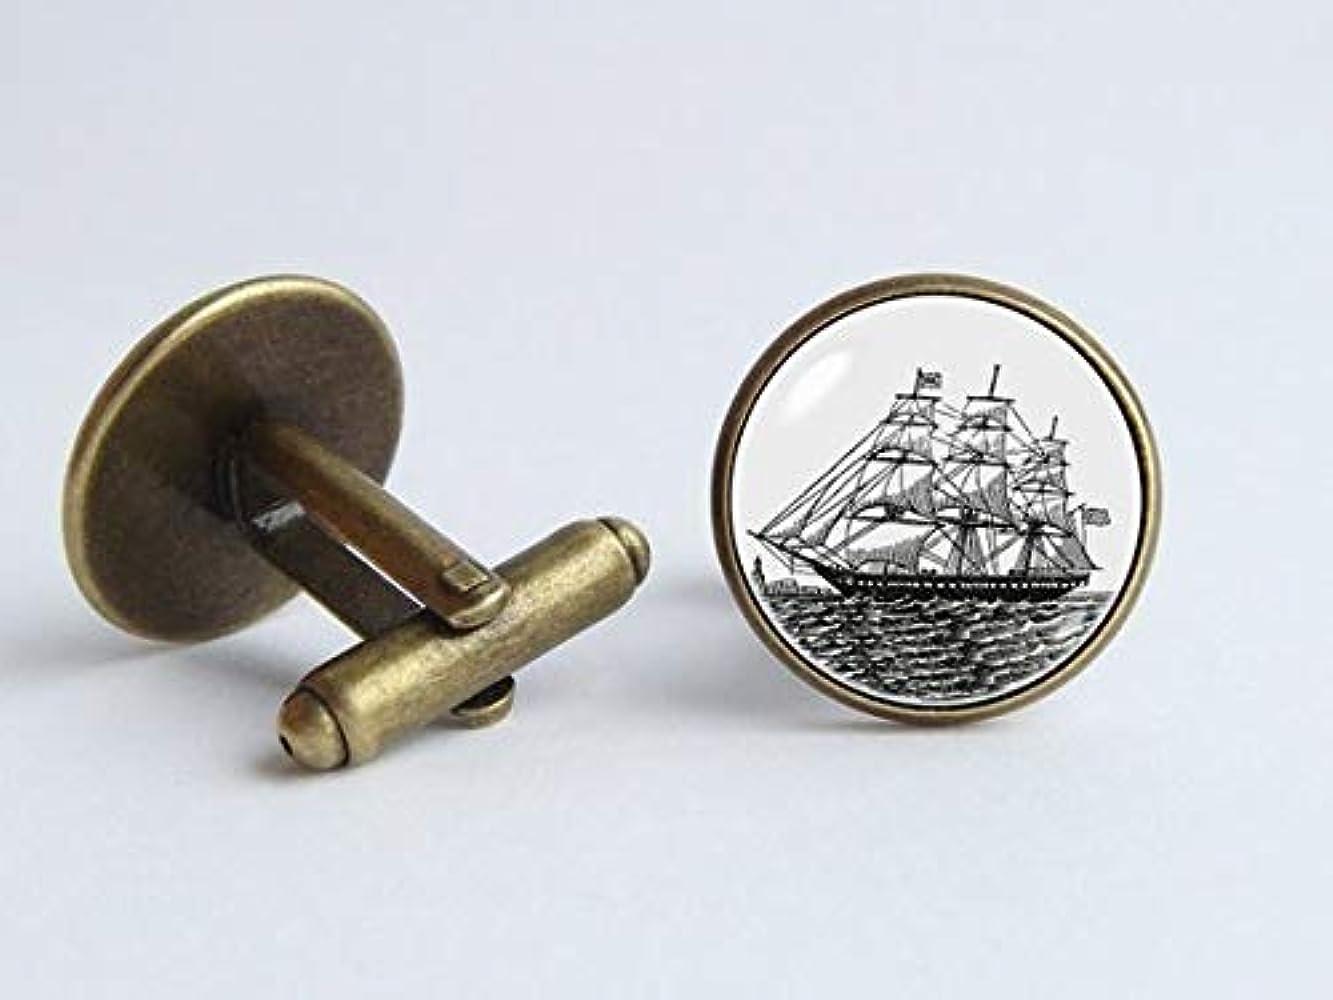 maritime gifts mens jewellery,sailor gifts Silver cufflinks Yacht cufflinks Classic cufflinks yachts men Yachts Nautical Gifts